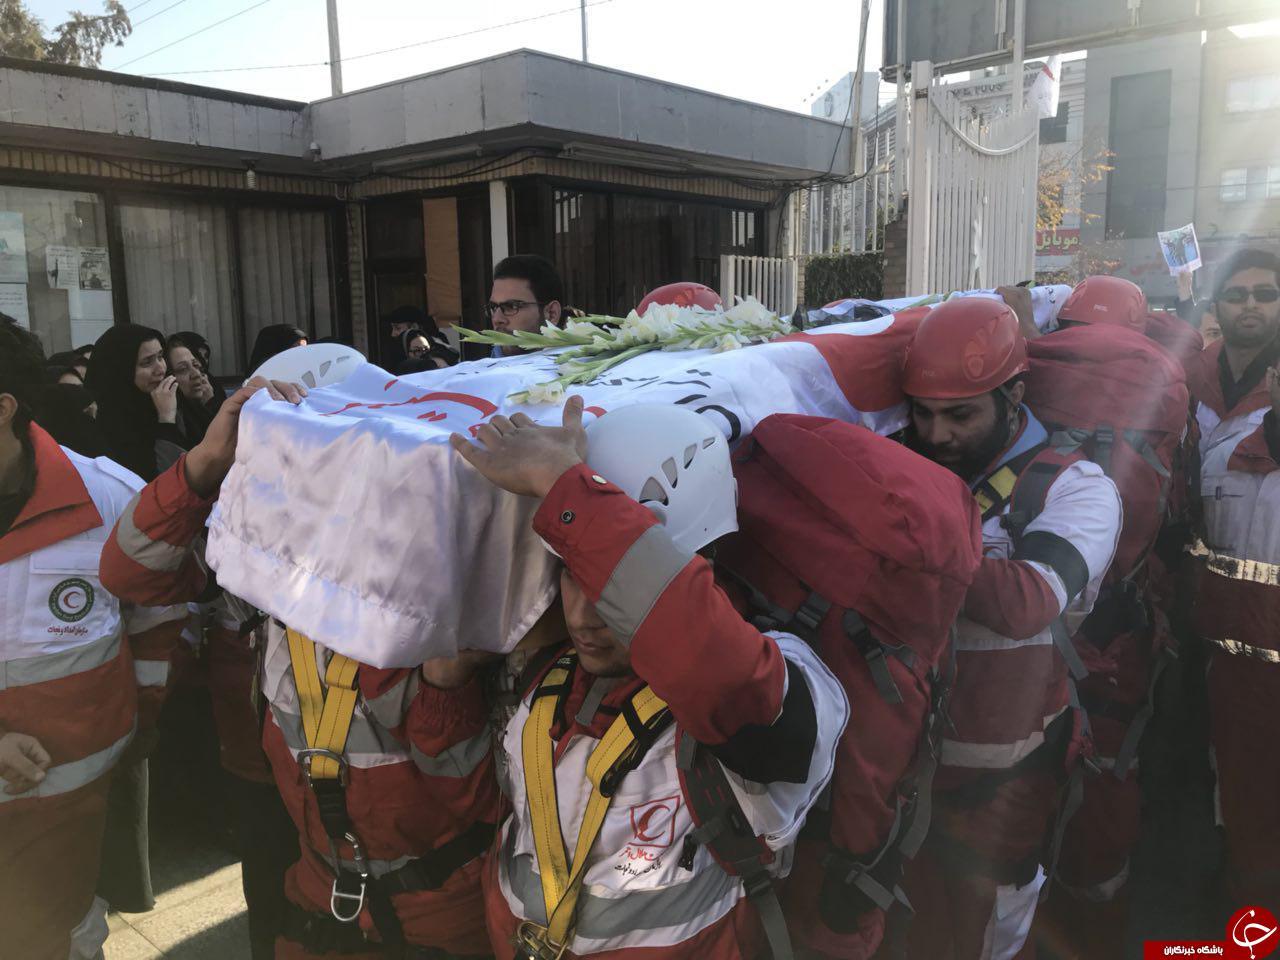 تشییع پیکر سیدعلی حسینی کوهنورد مشهدی حادثه اشترانکوه+ تصاویر